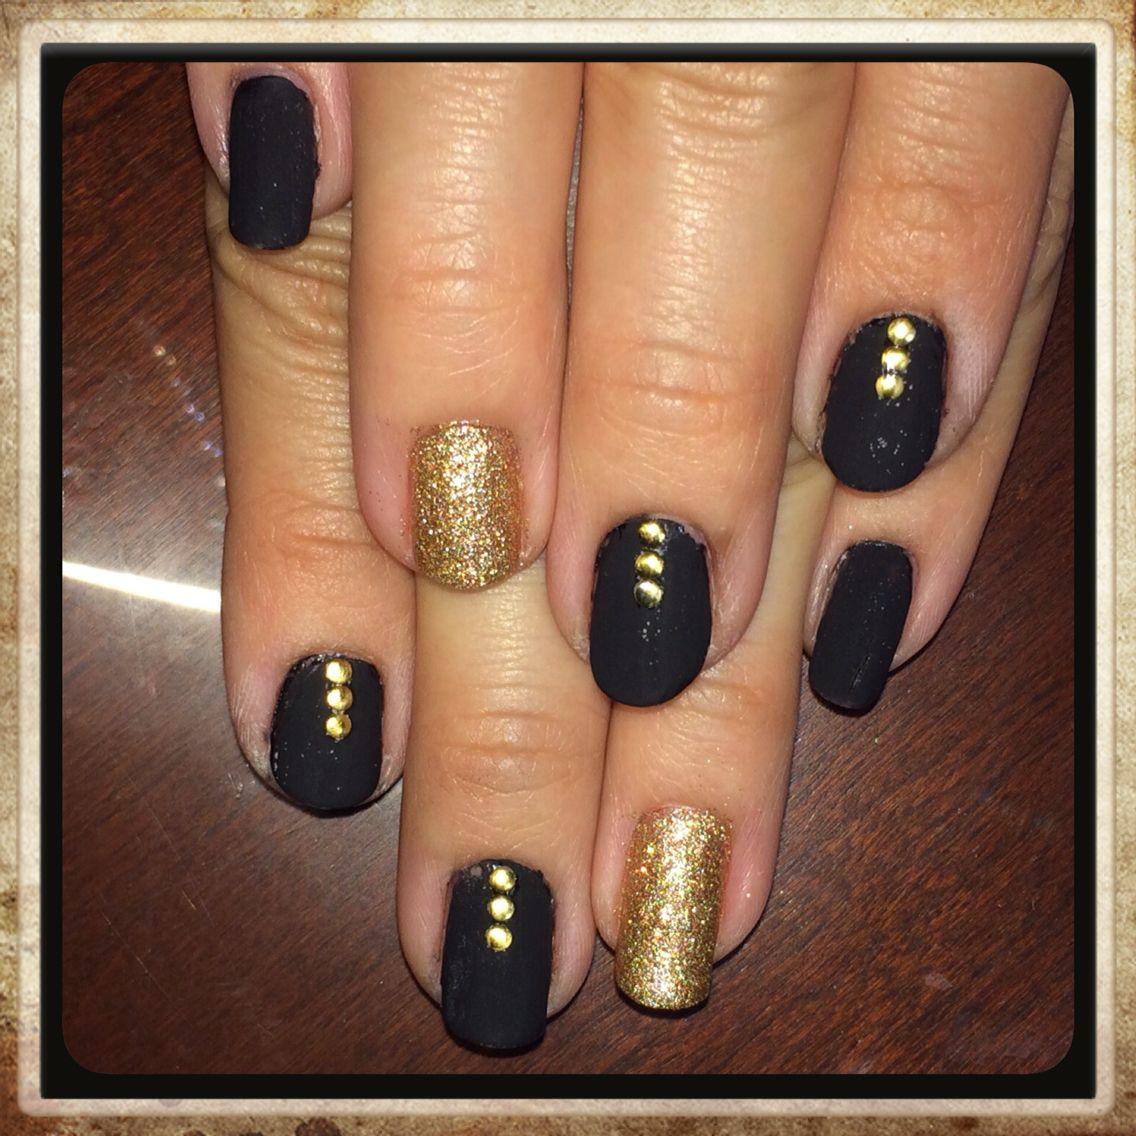 matte stud nails   Nail art   Pinterest   Stud nails